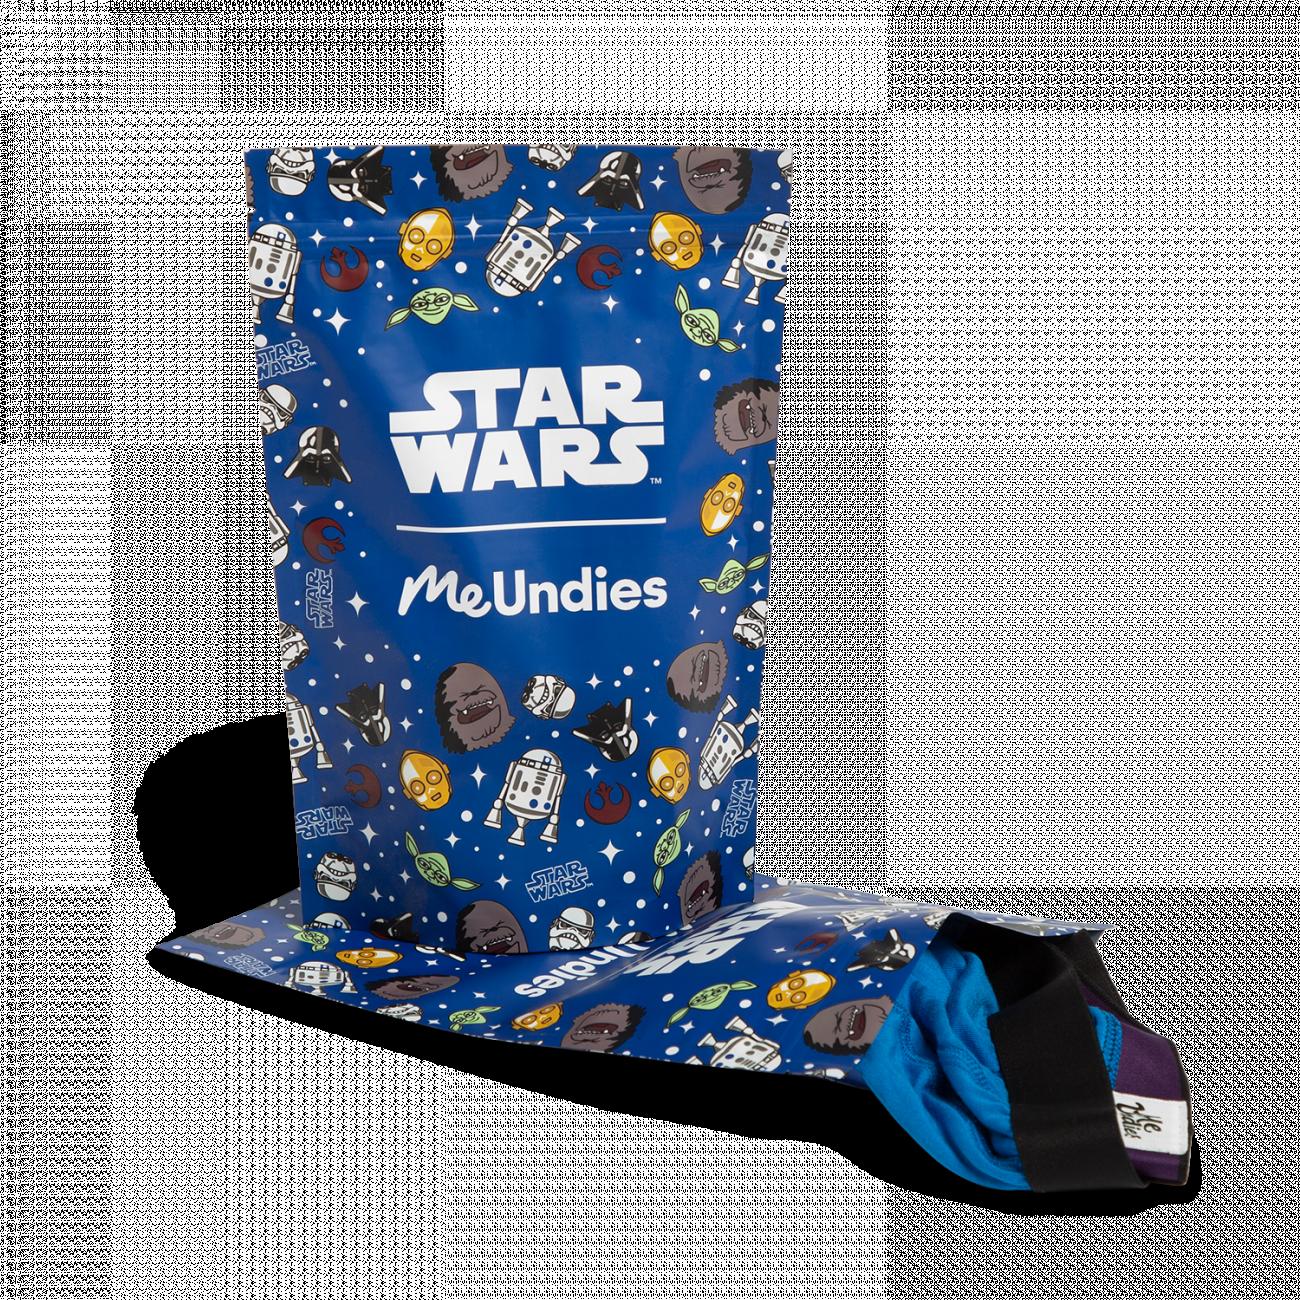 MeUndies Star Wars